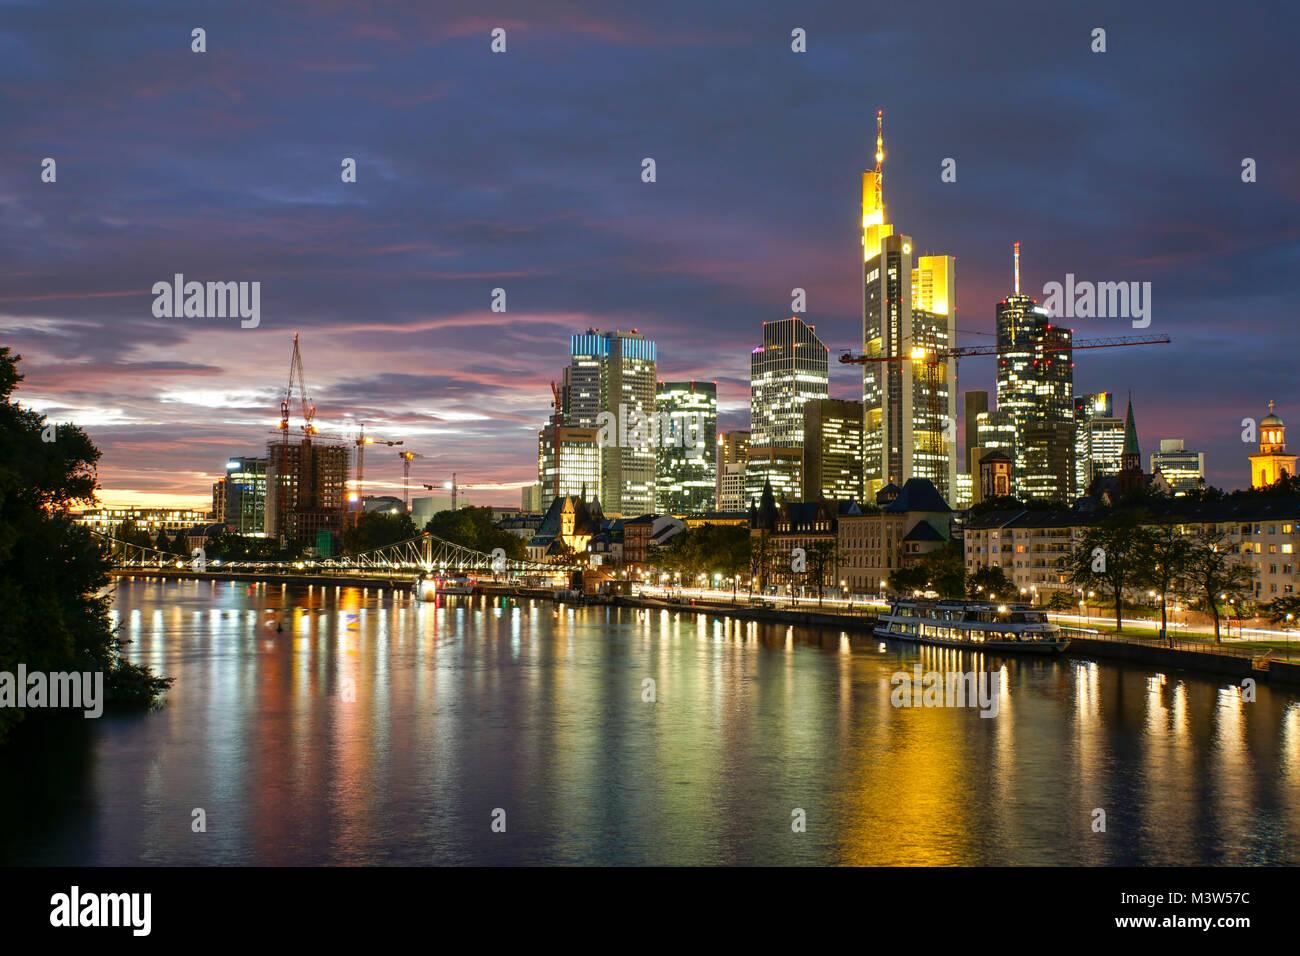 Eisener Steg bridge, Skyline of financial  district,  Frankfurt - Main, Germany - Stock Image